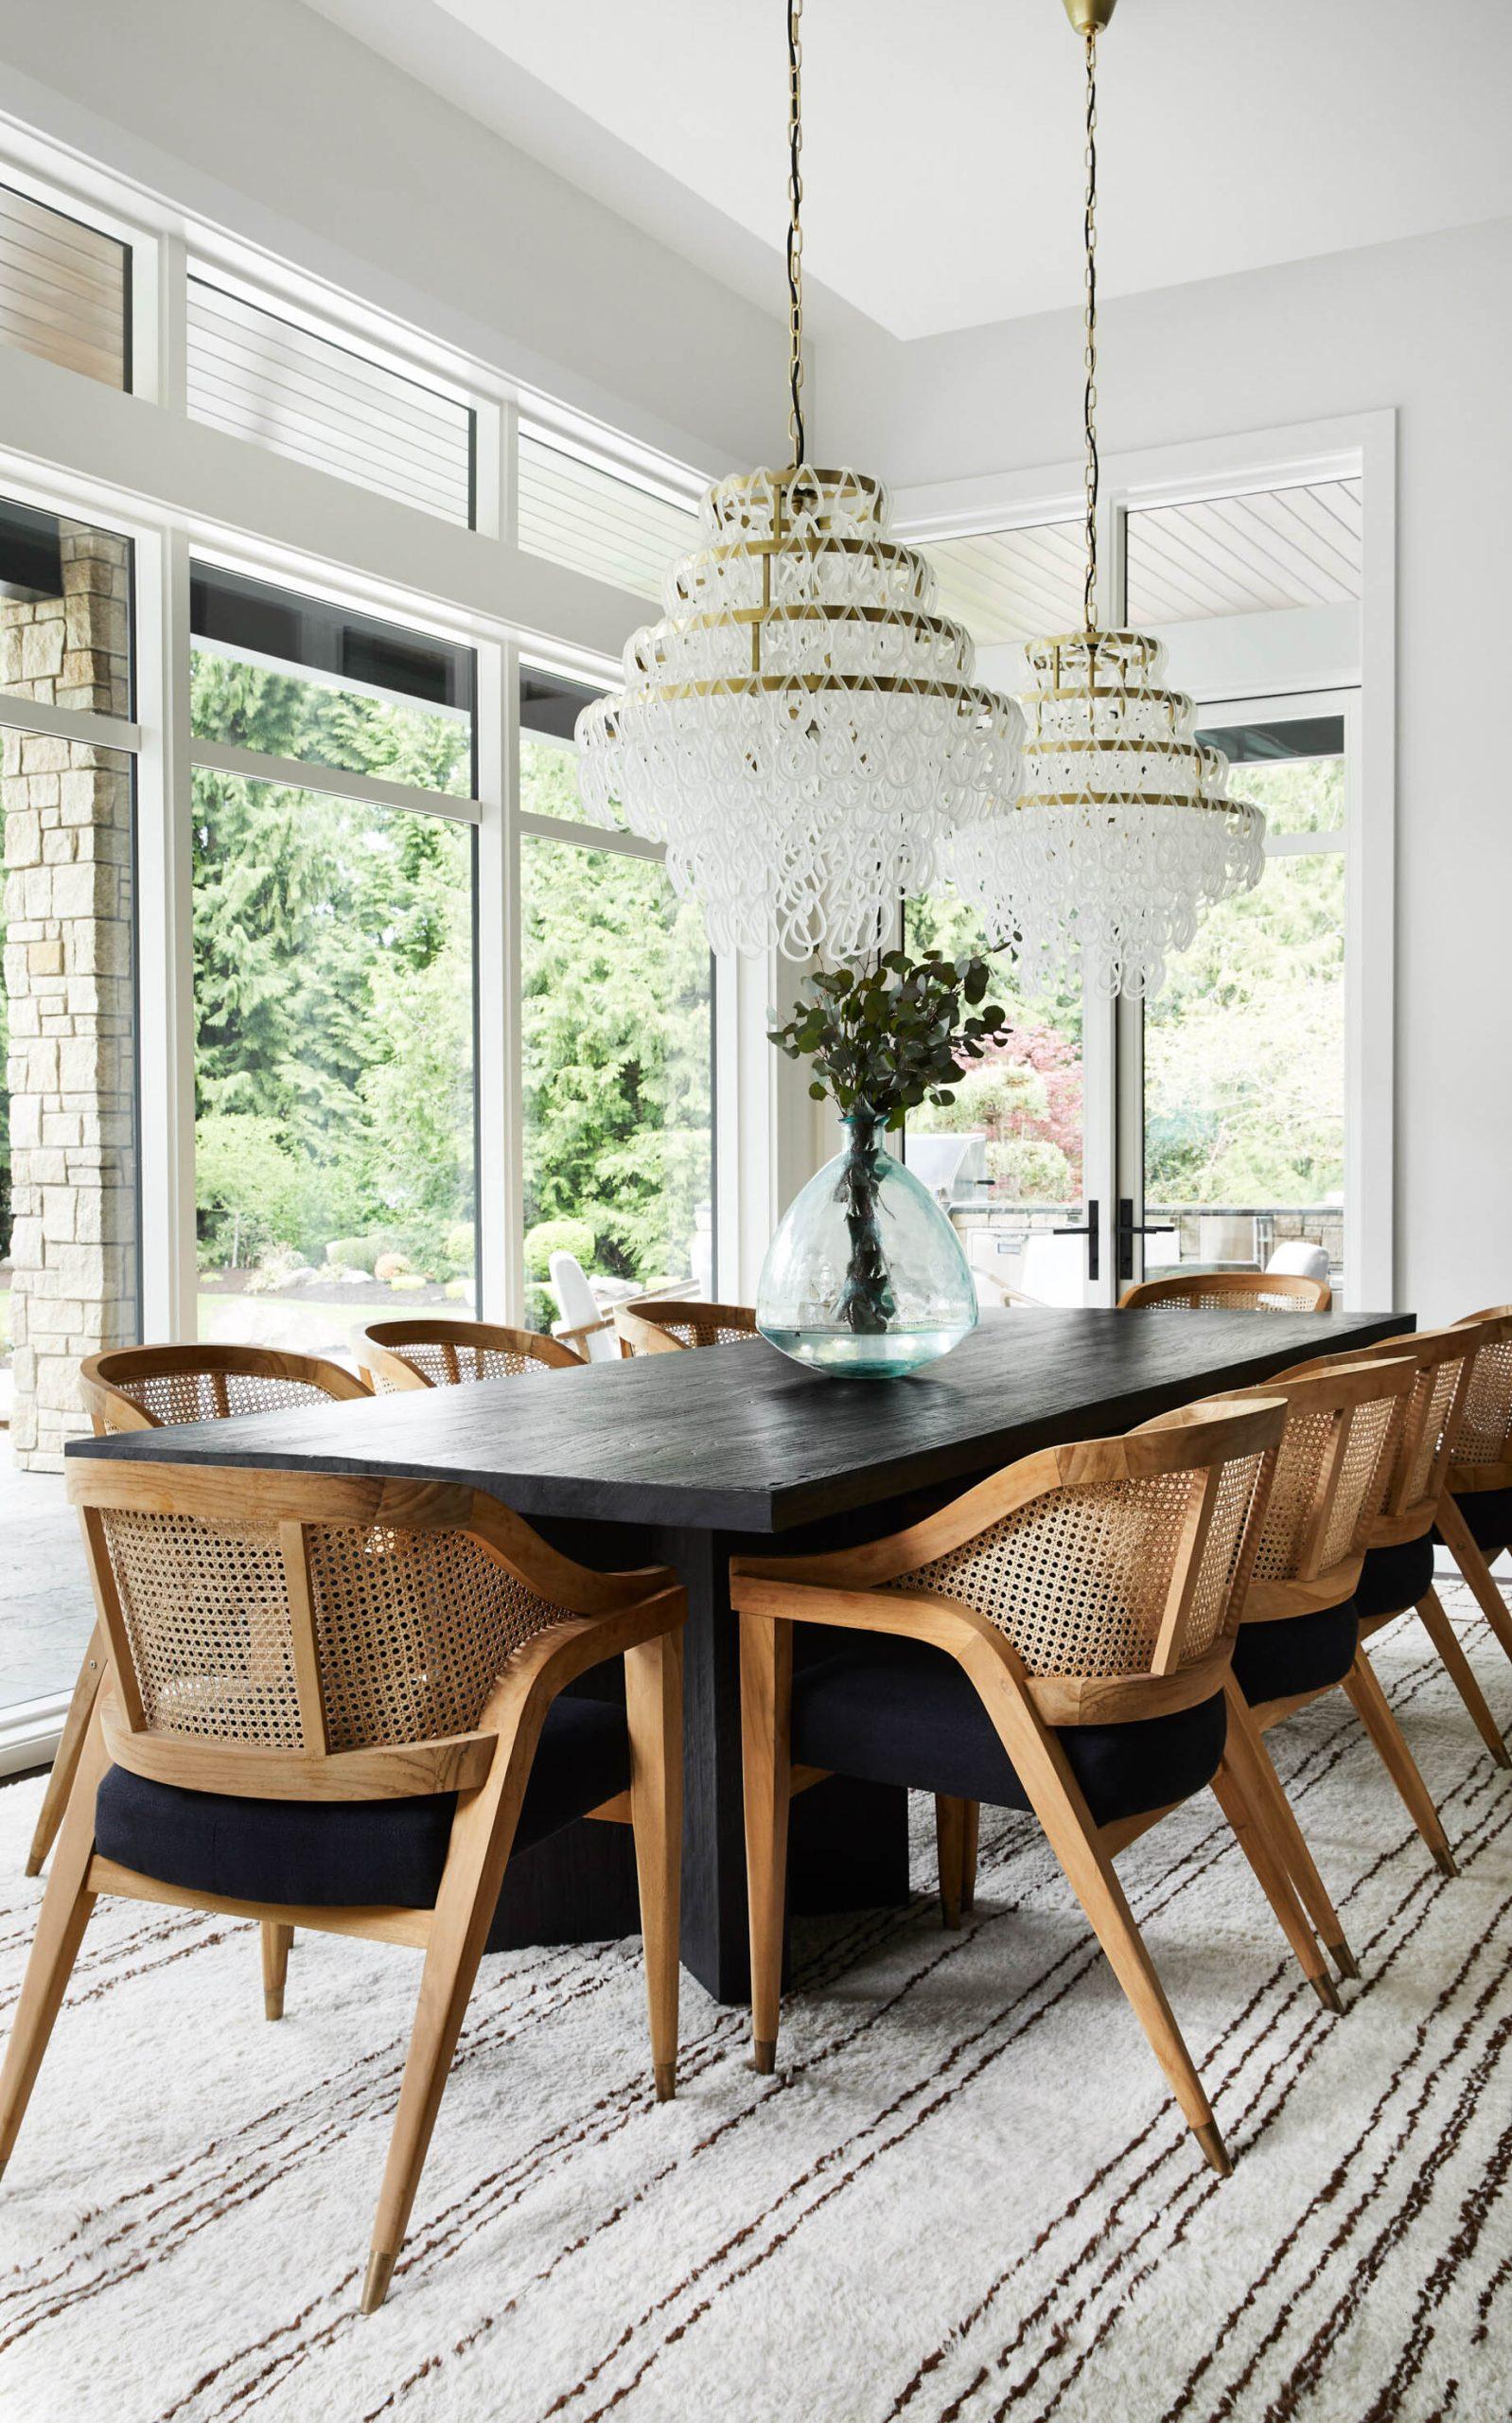 Exquisite Lakehouse Interior Design Lake Tapps, WA, USA – Allison Lind